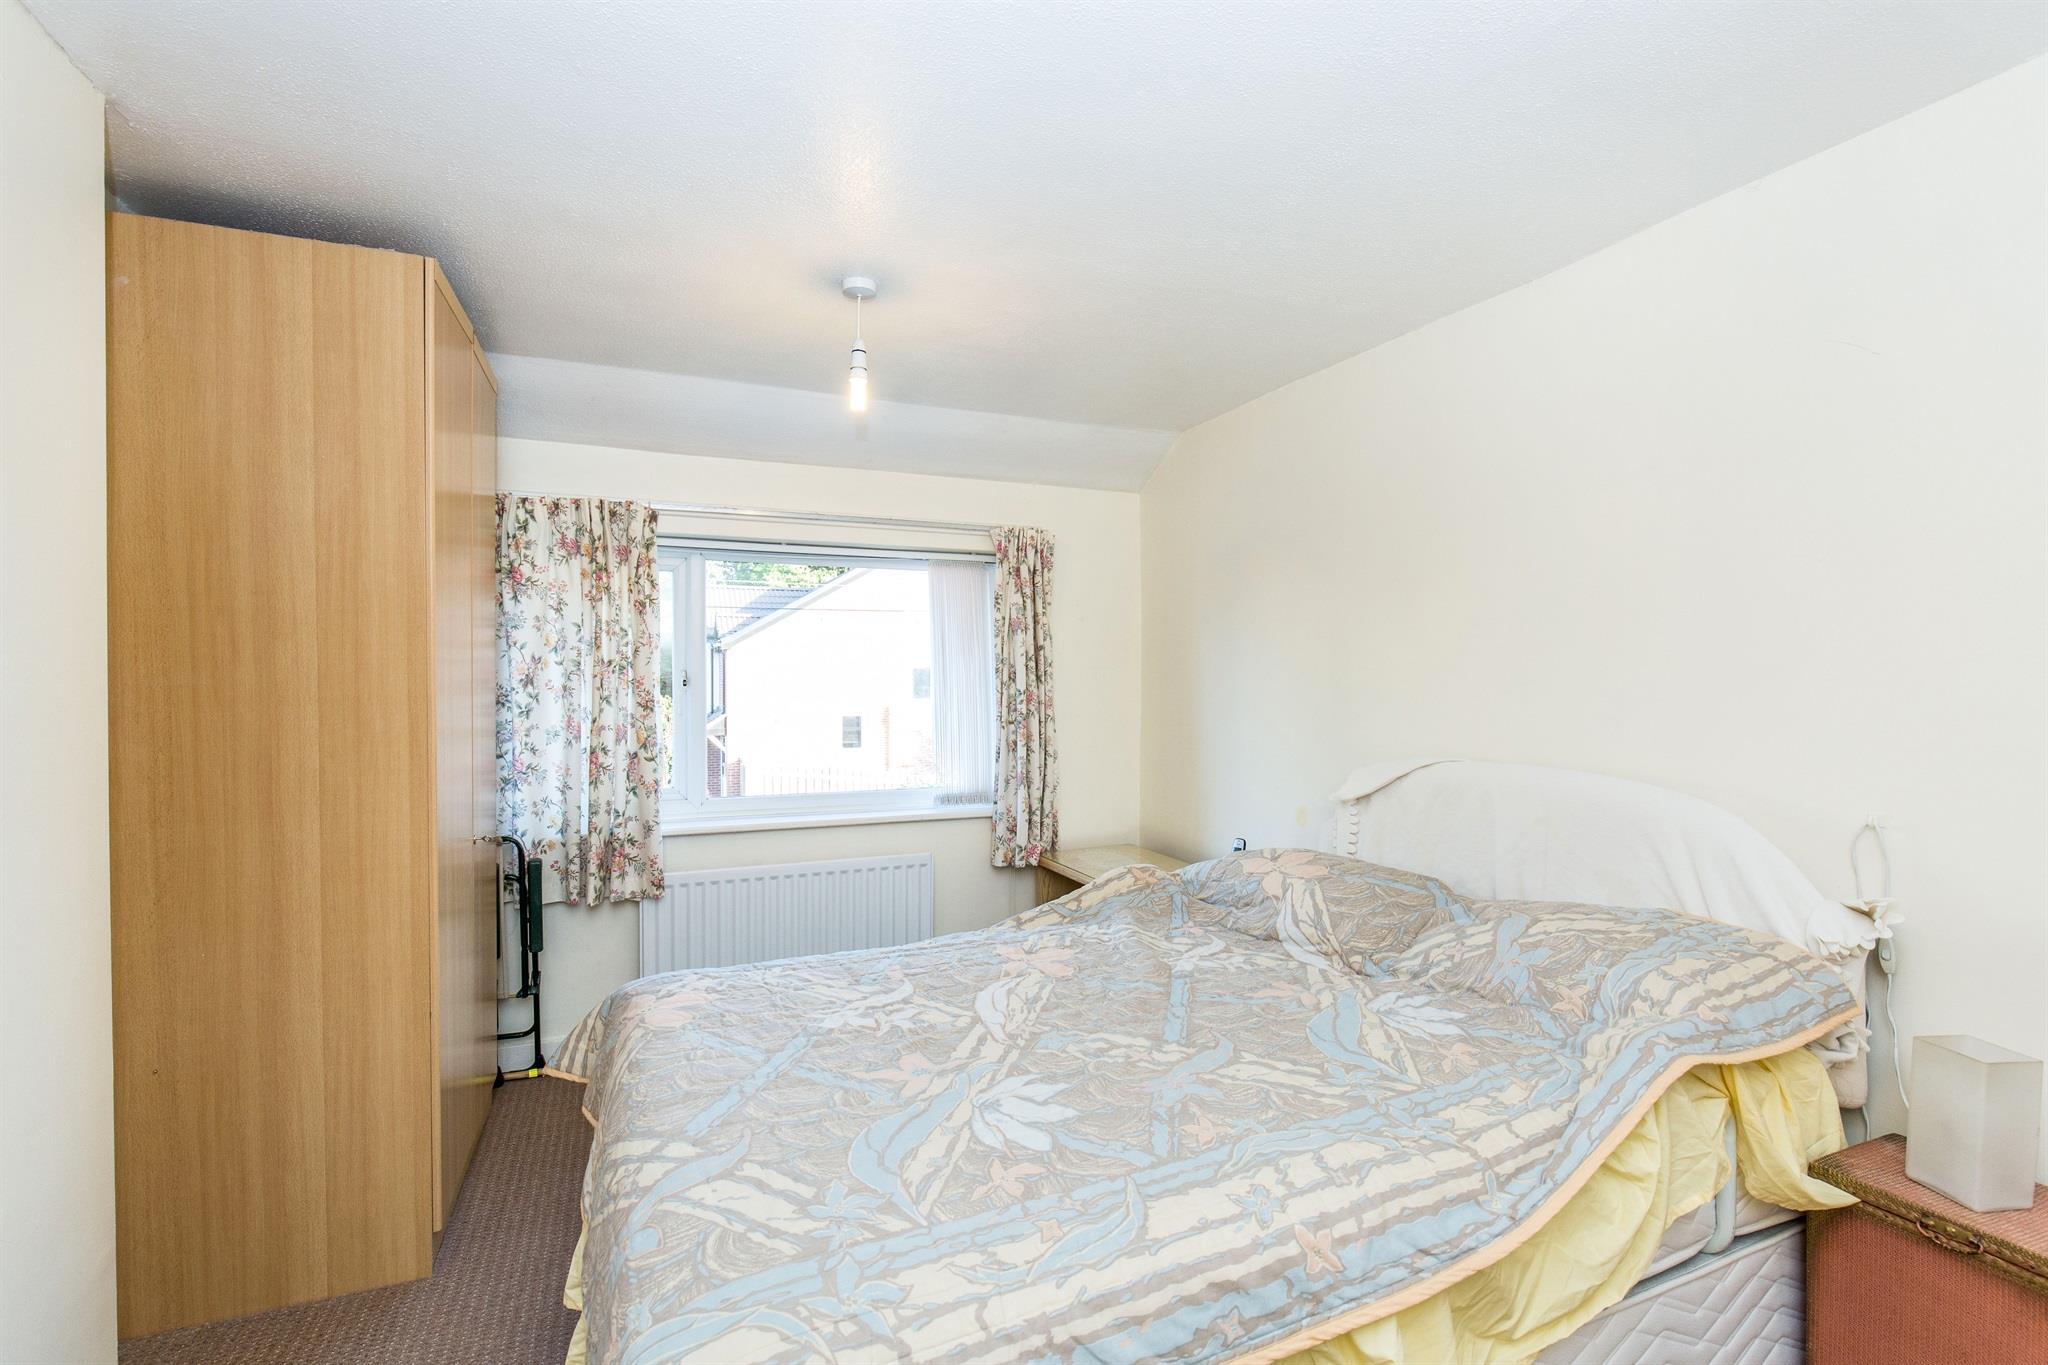 Is 747 A Good Credit Score >> 3 bedroom semi-detached house for sale, St Anns Rise, Leeds, LS4 2TJ – TheHouseShop.com